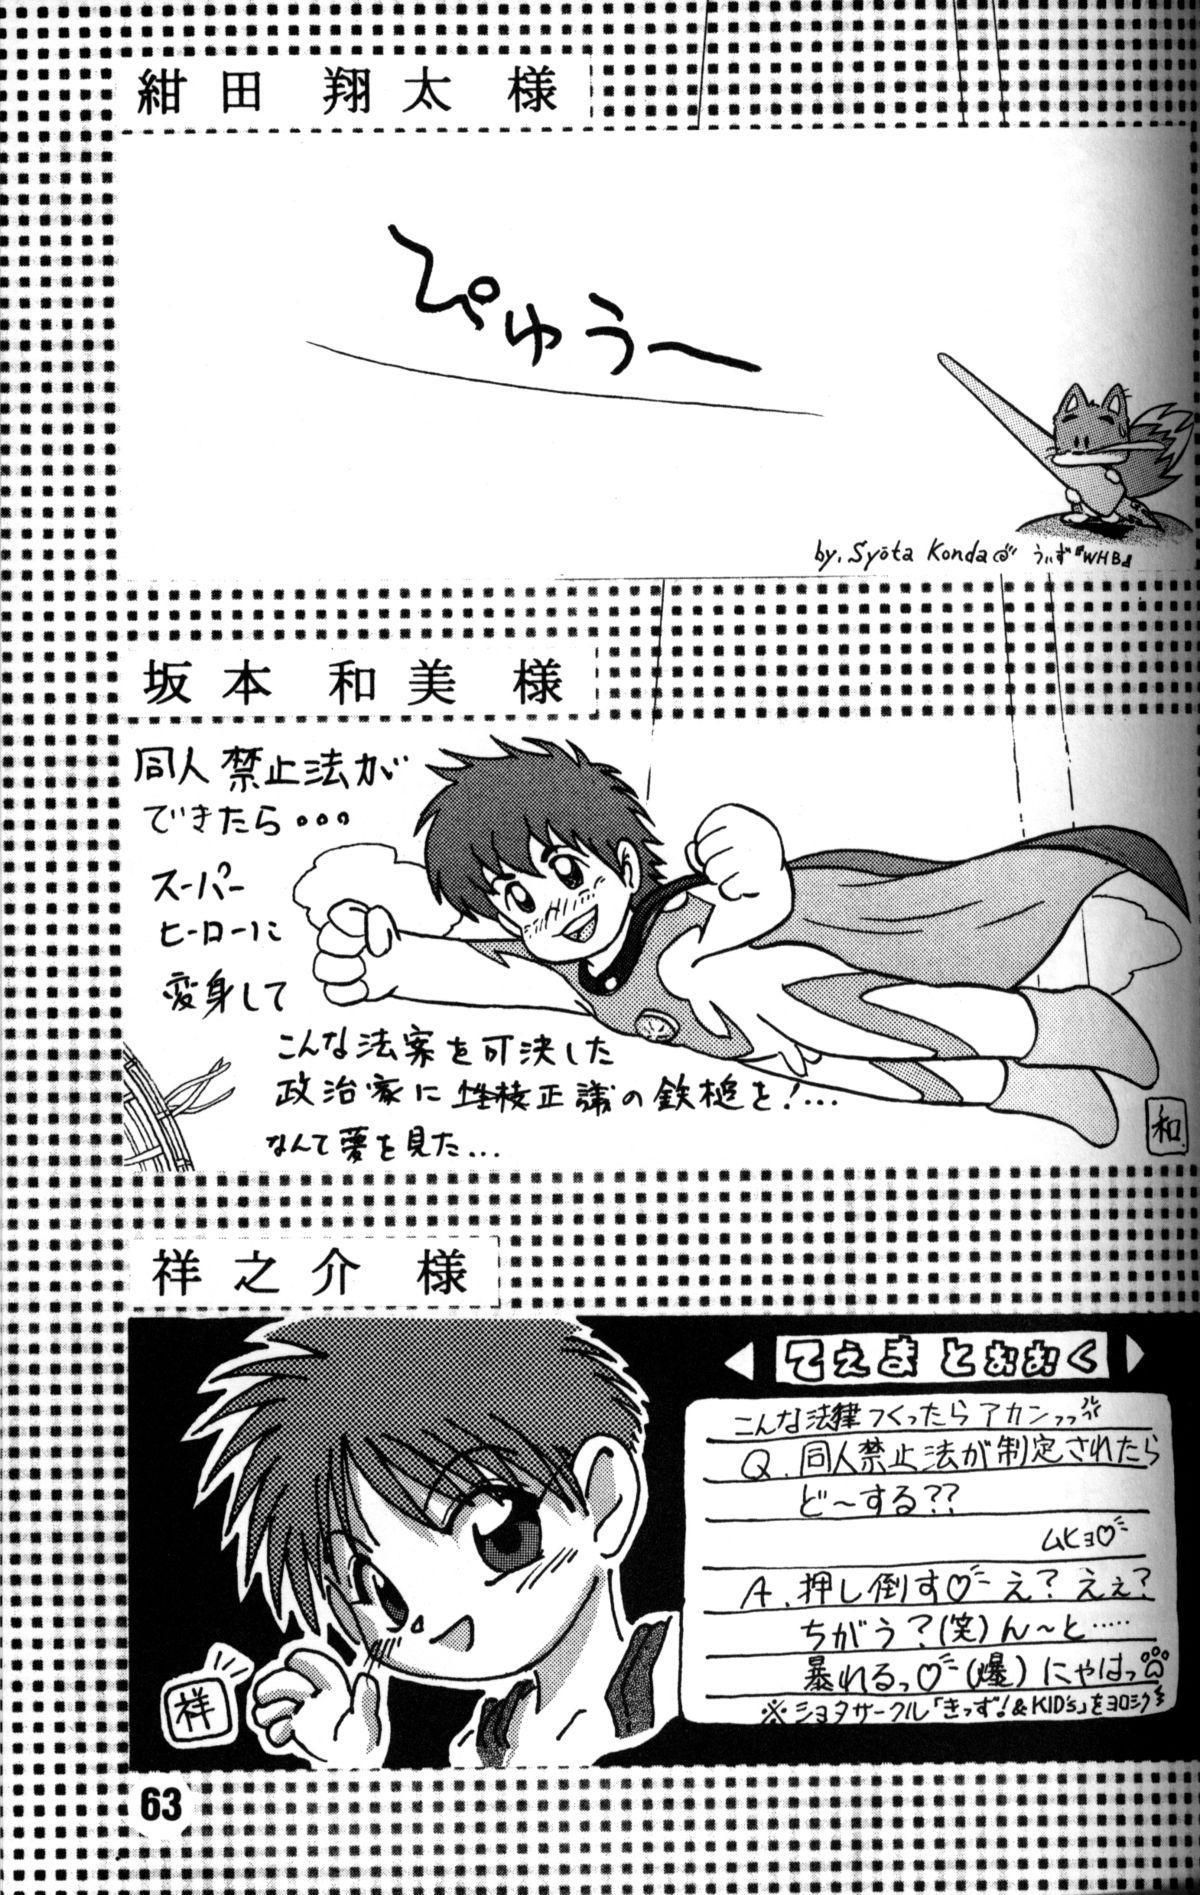 Anthology - Nekketsu Project - Volume 4 'Shounen Vanilla Essence' 61